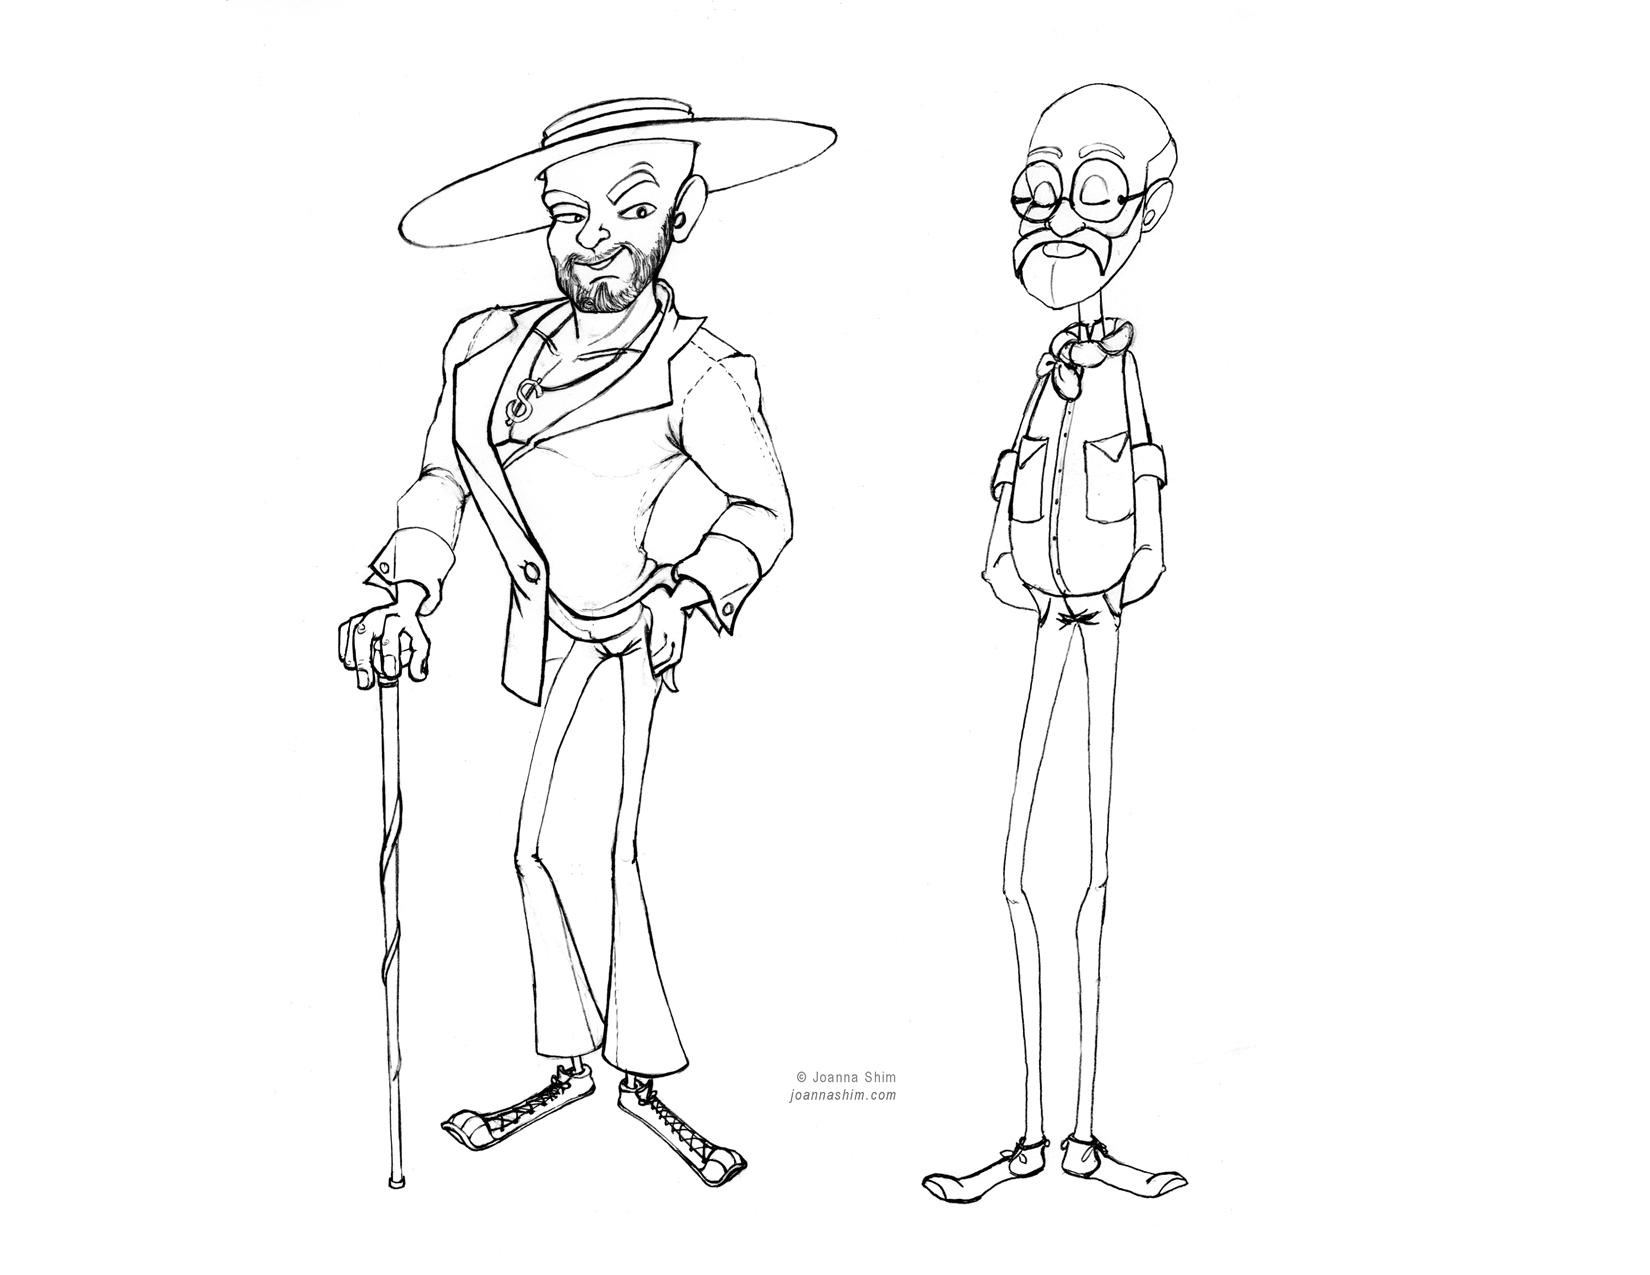 Character studies